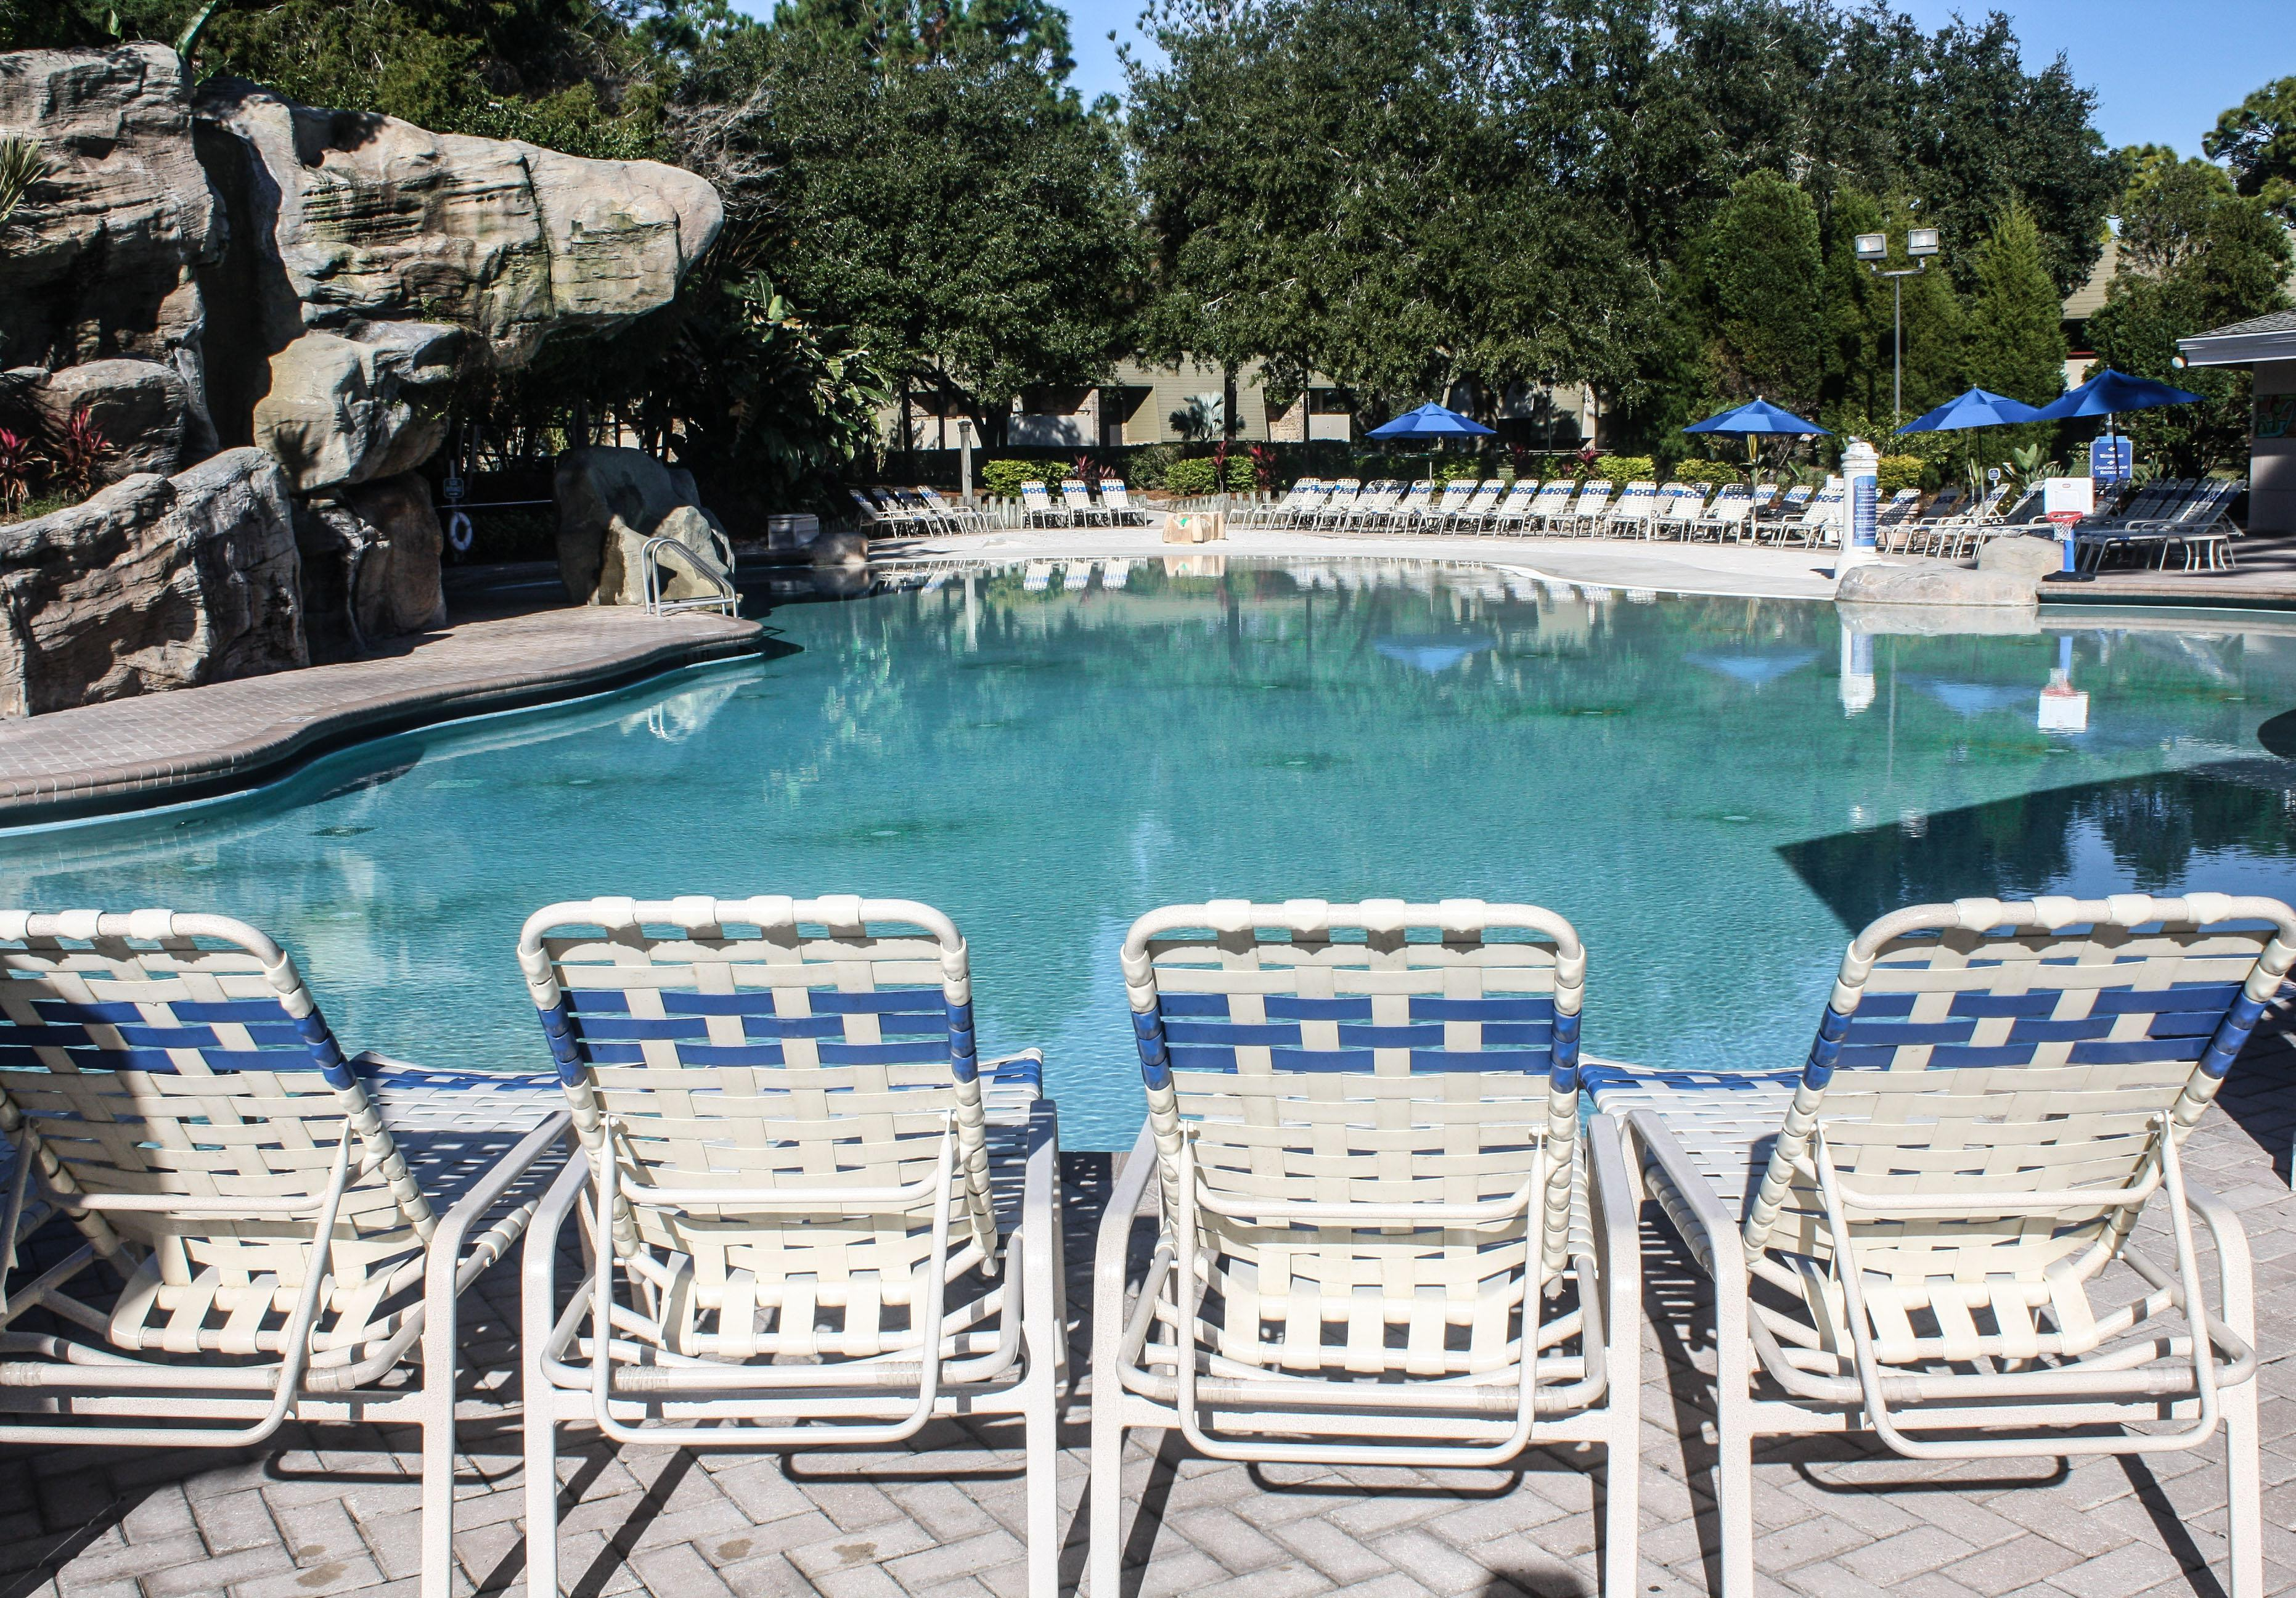 Innisbrook golf spa resort palm harbor florida for Florida pool show 2015